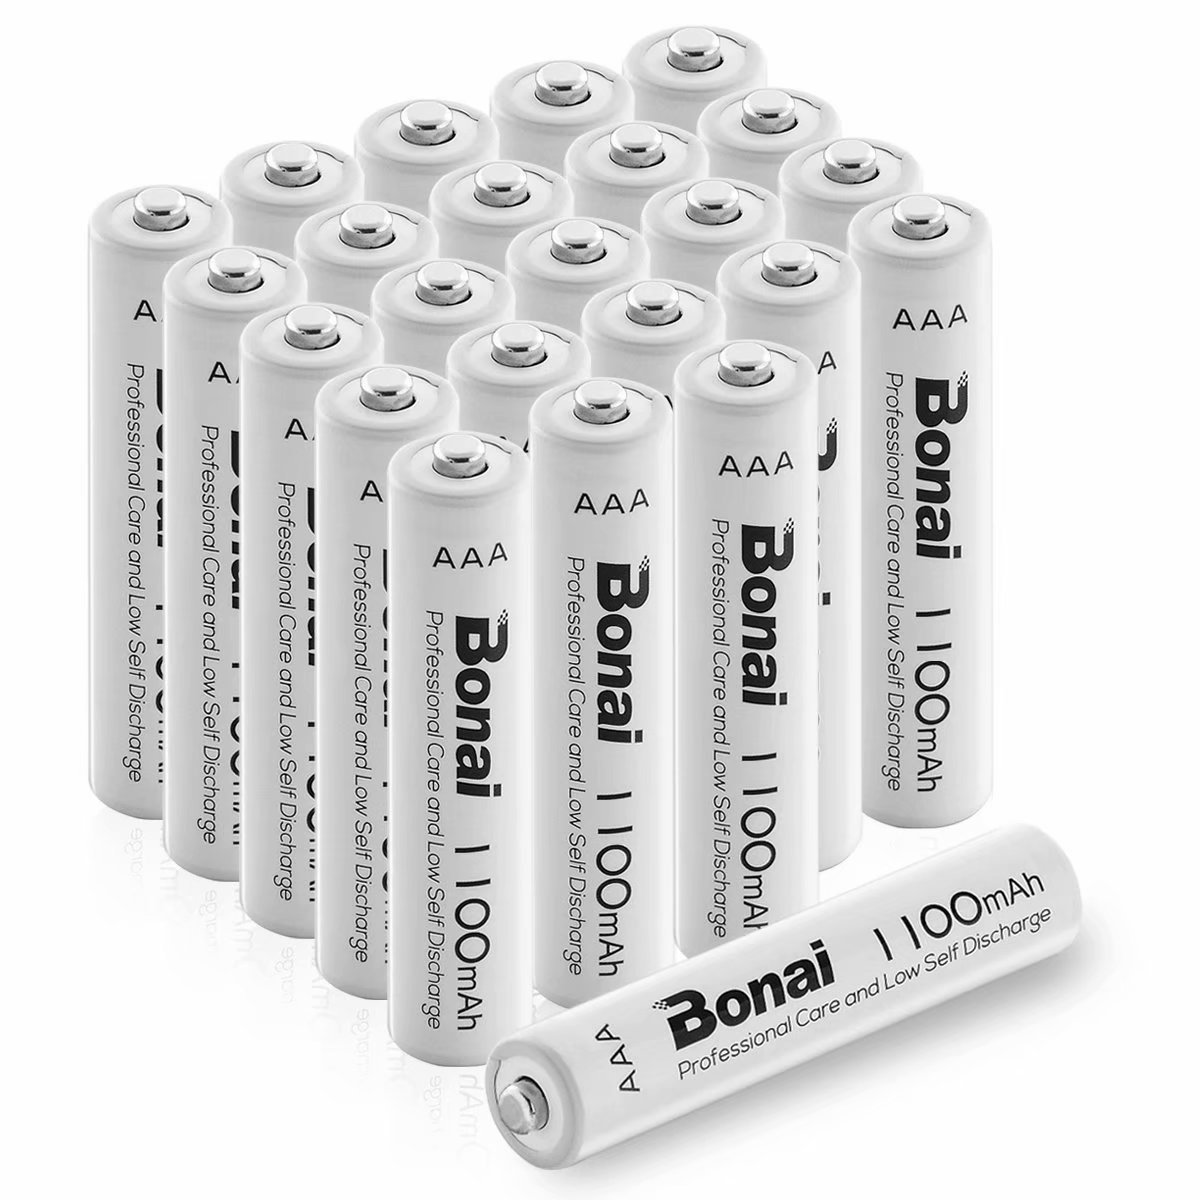 BONAI 1100mAh AAA Rechargeable Batteries 24 Pack 1.2V Ni-MH High-Capacity Batteries - UL Certificate Triple a Batteries by BONAI